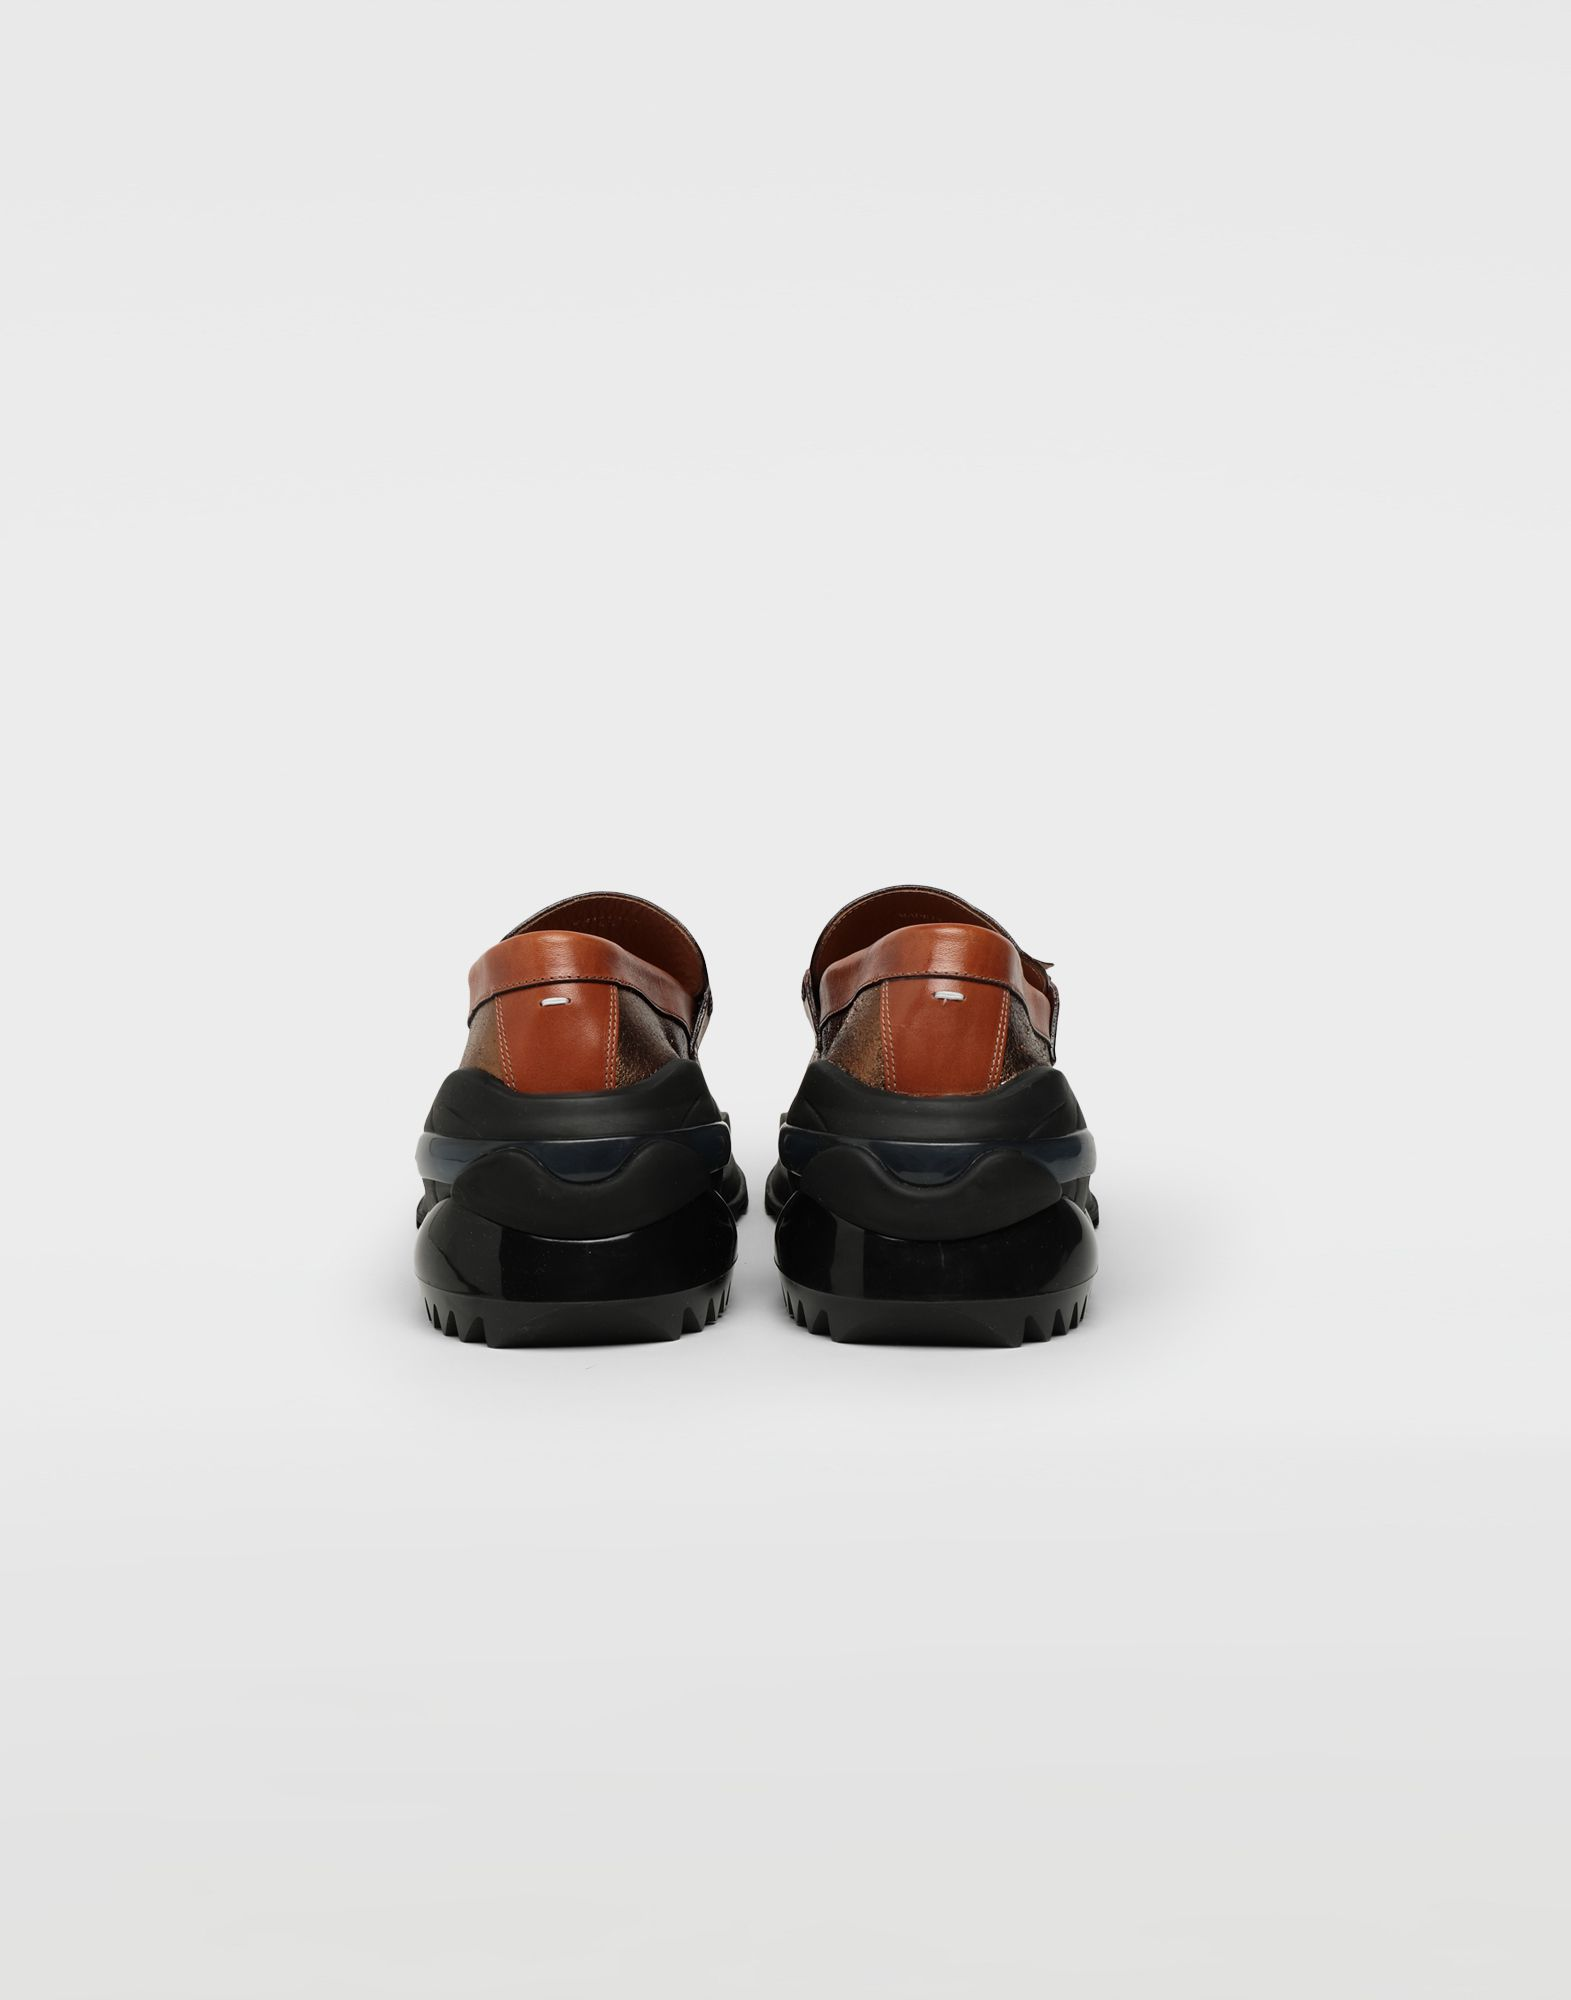 MAISON MARGIELA Gespleißte Sneakers mit Tasselloafer Mokassins Herren d